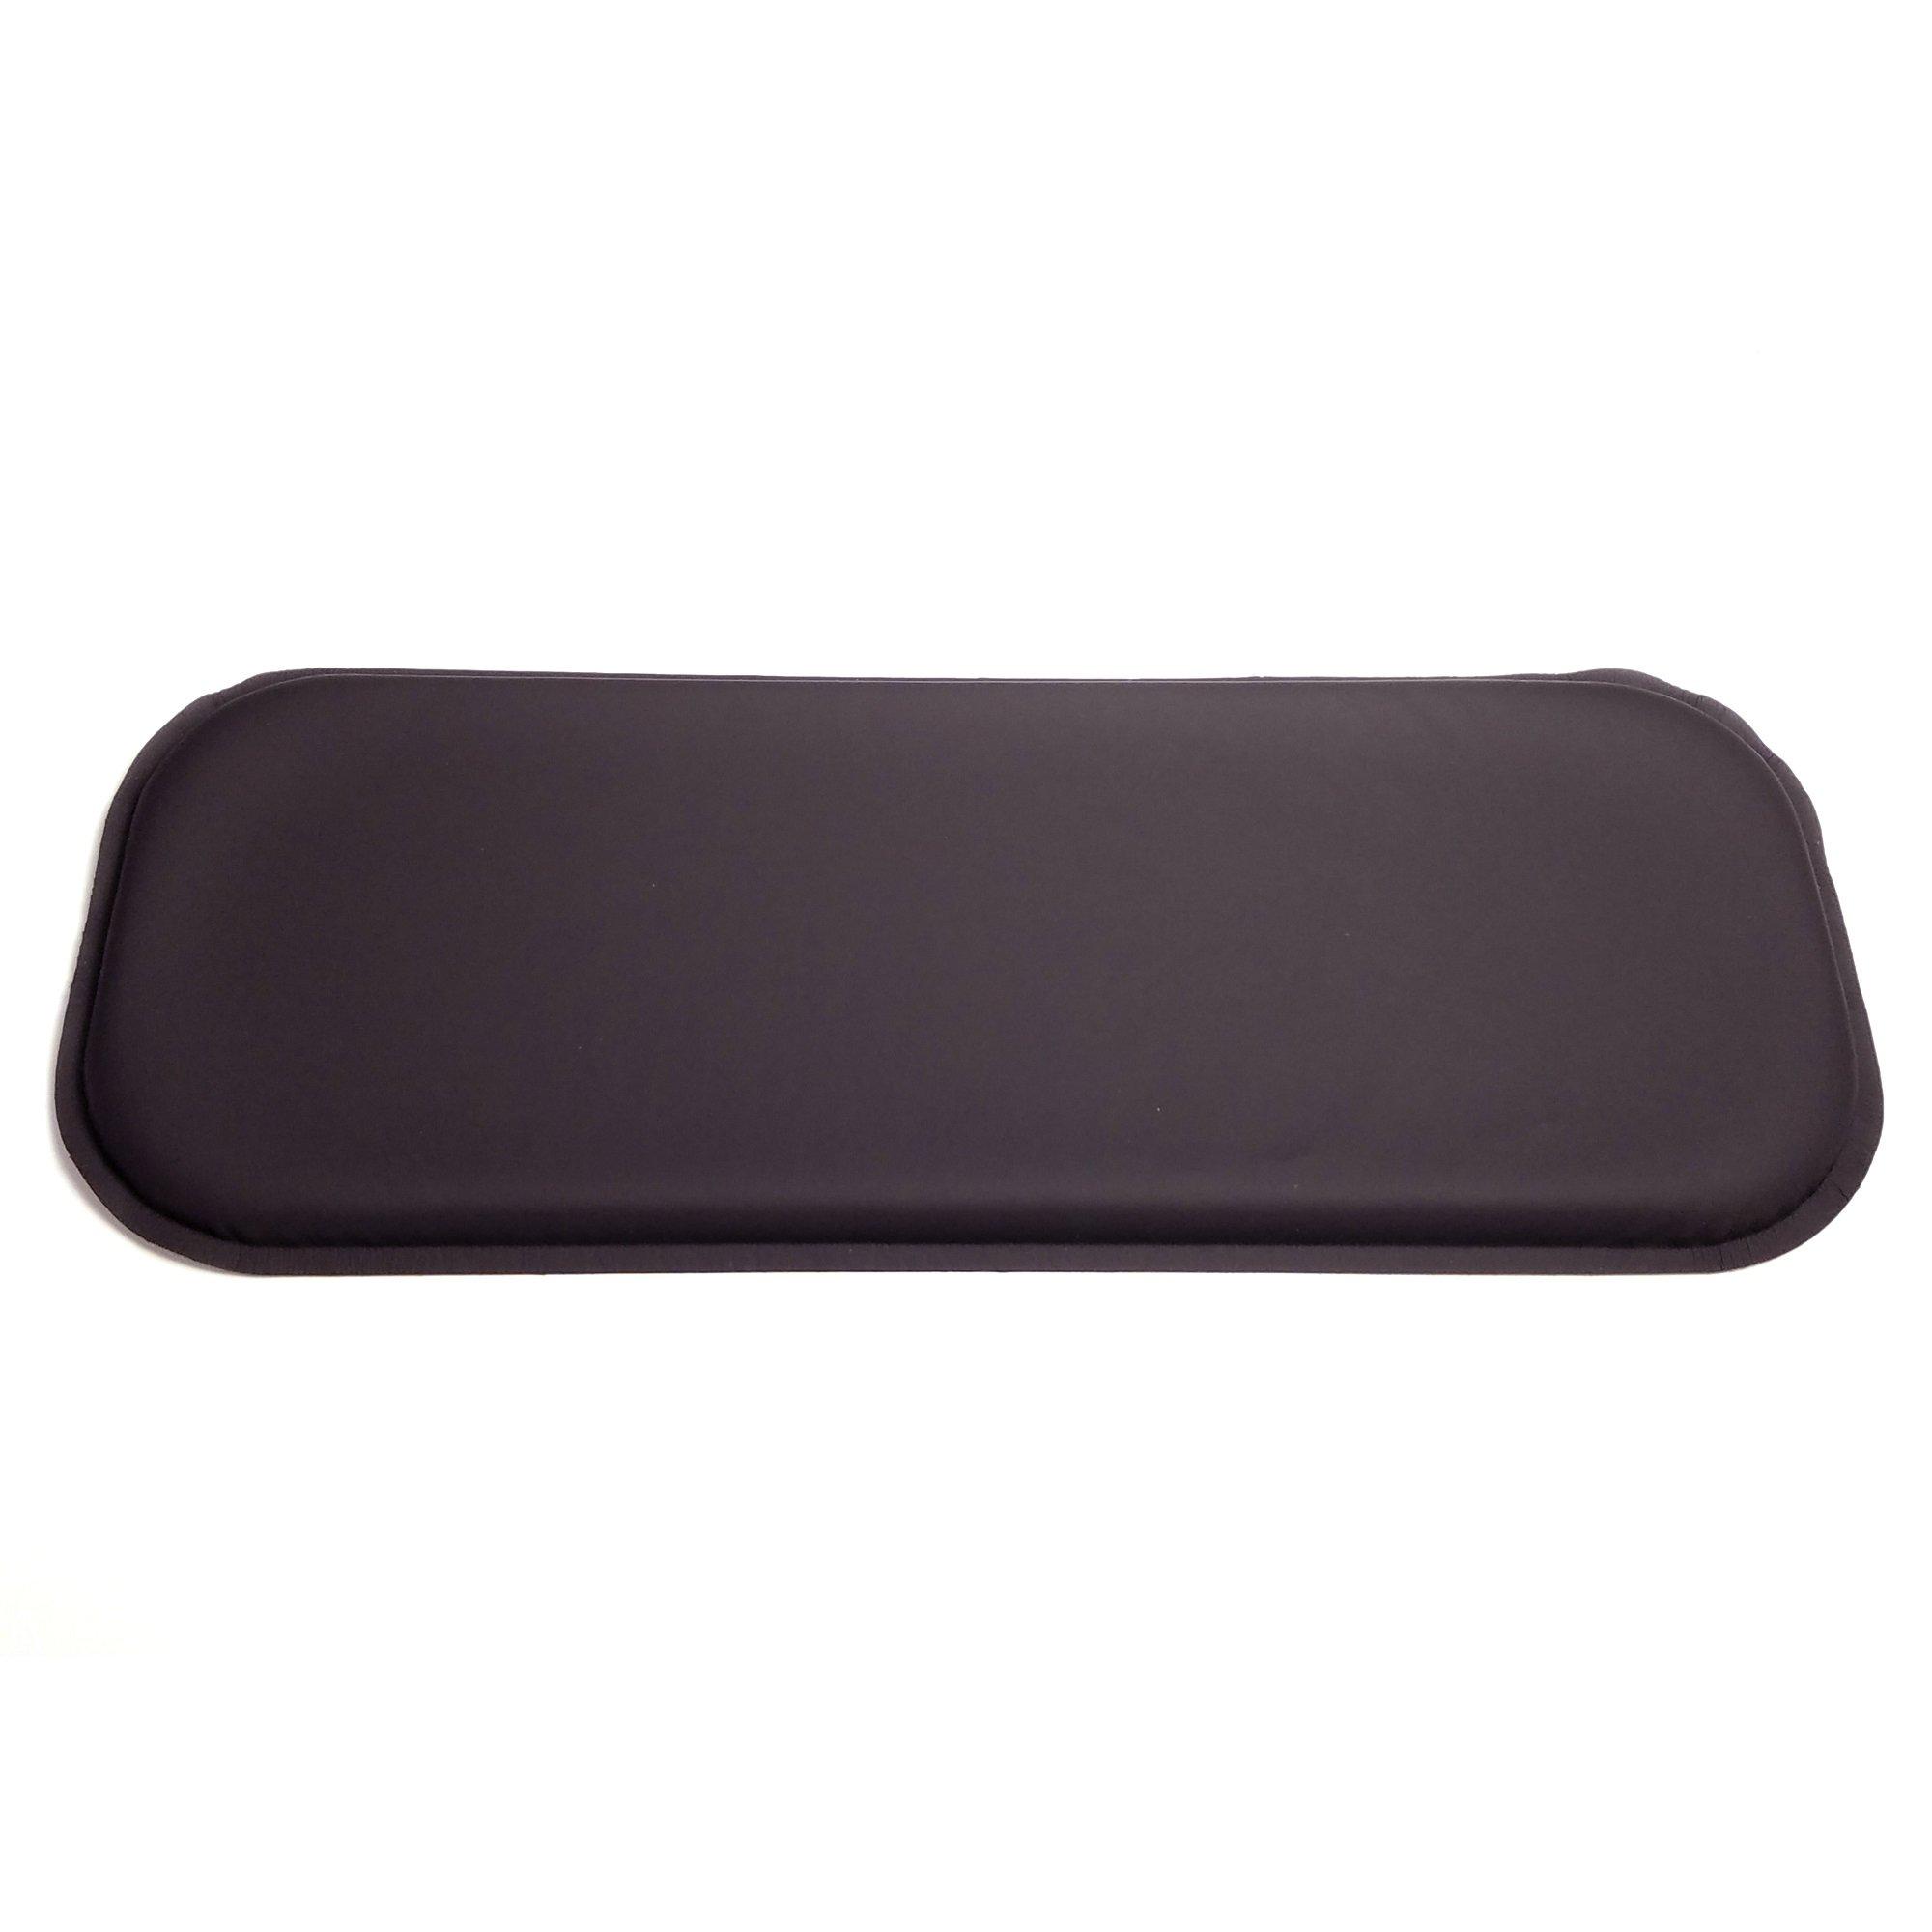 ULTRAGEL ''Gaming'' Super Comfy Arm/Elbow/Wrist Rest Gel Pads (SLIM 5x12.5, Black)